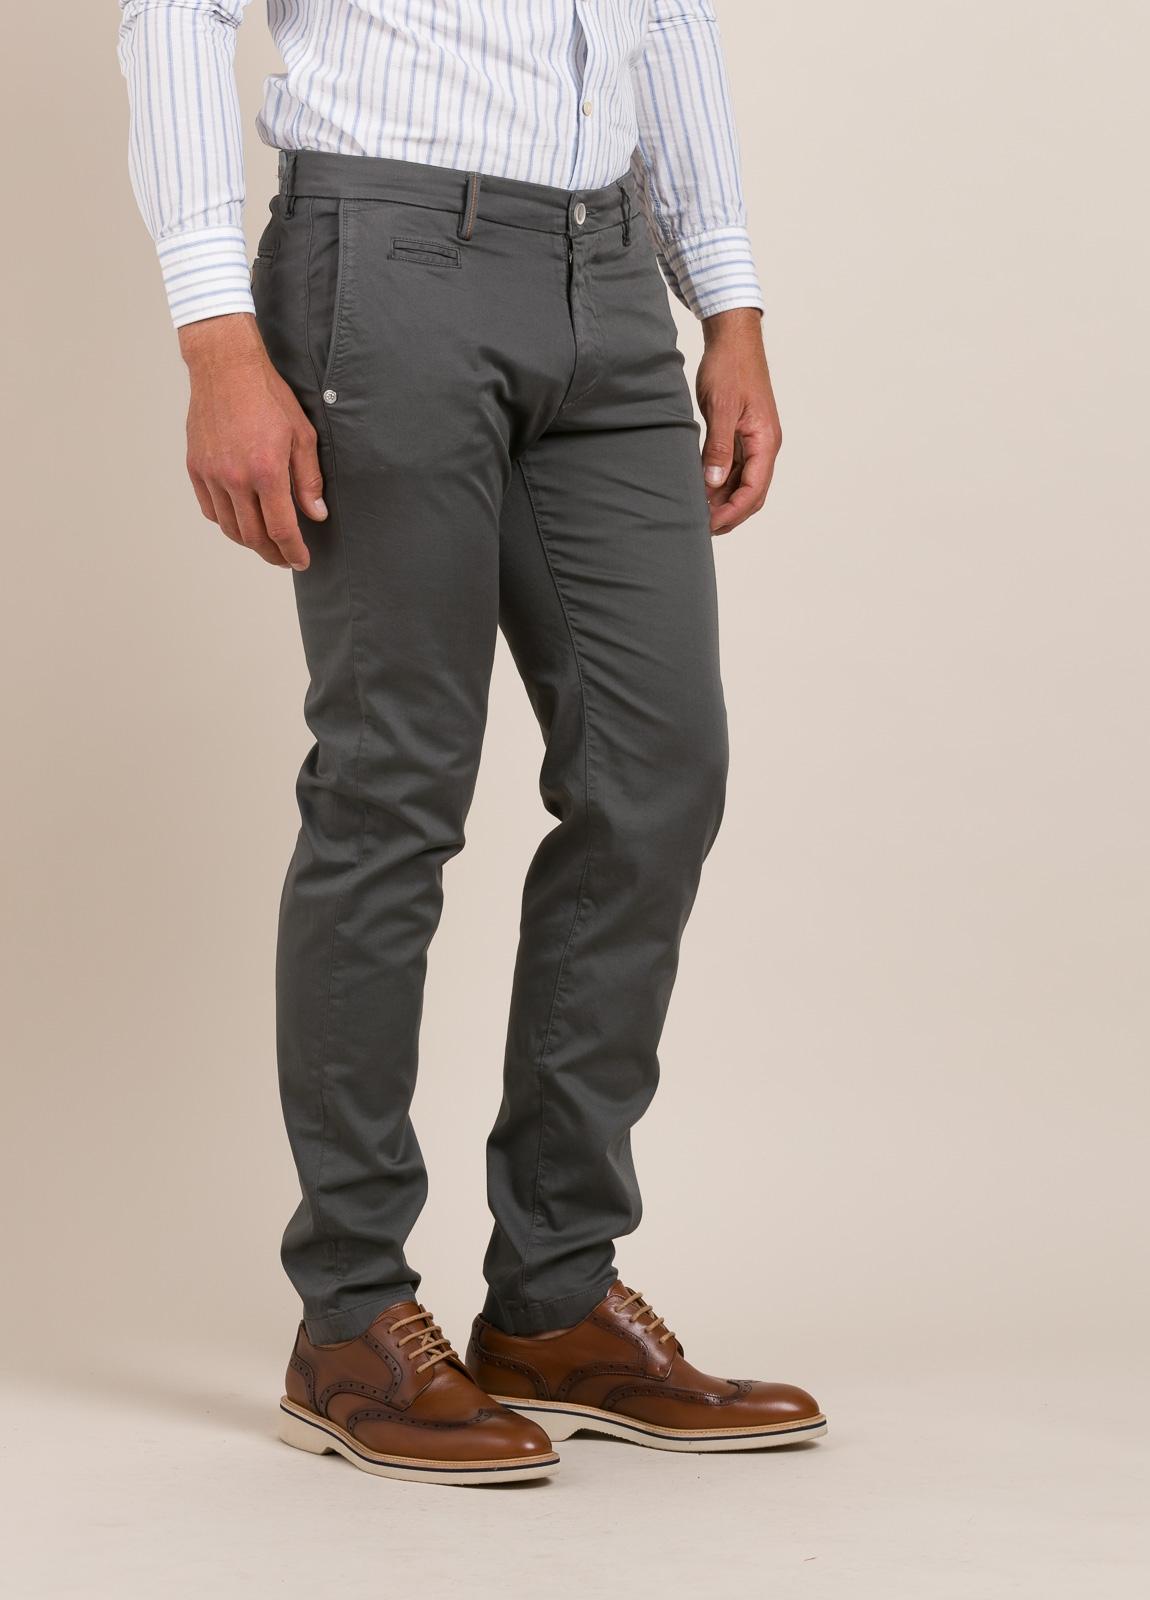 Pantalón sport RE-HASH slim fit gris - Ítem3